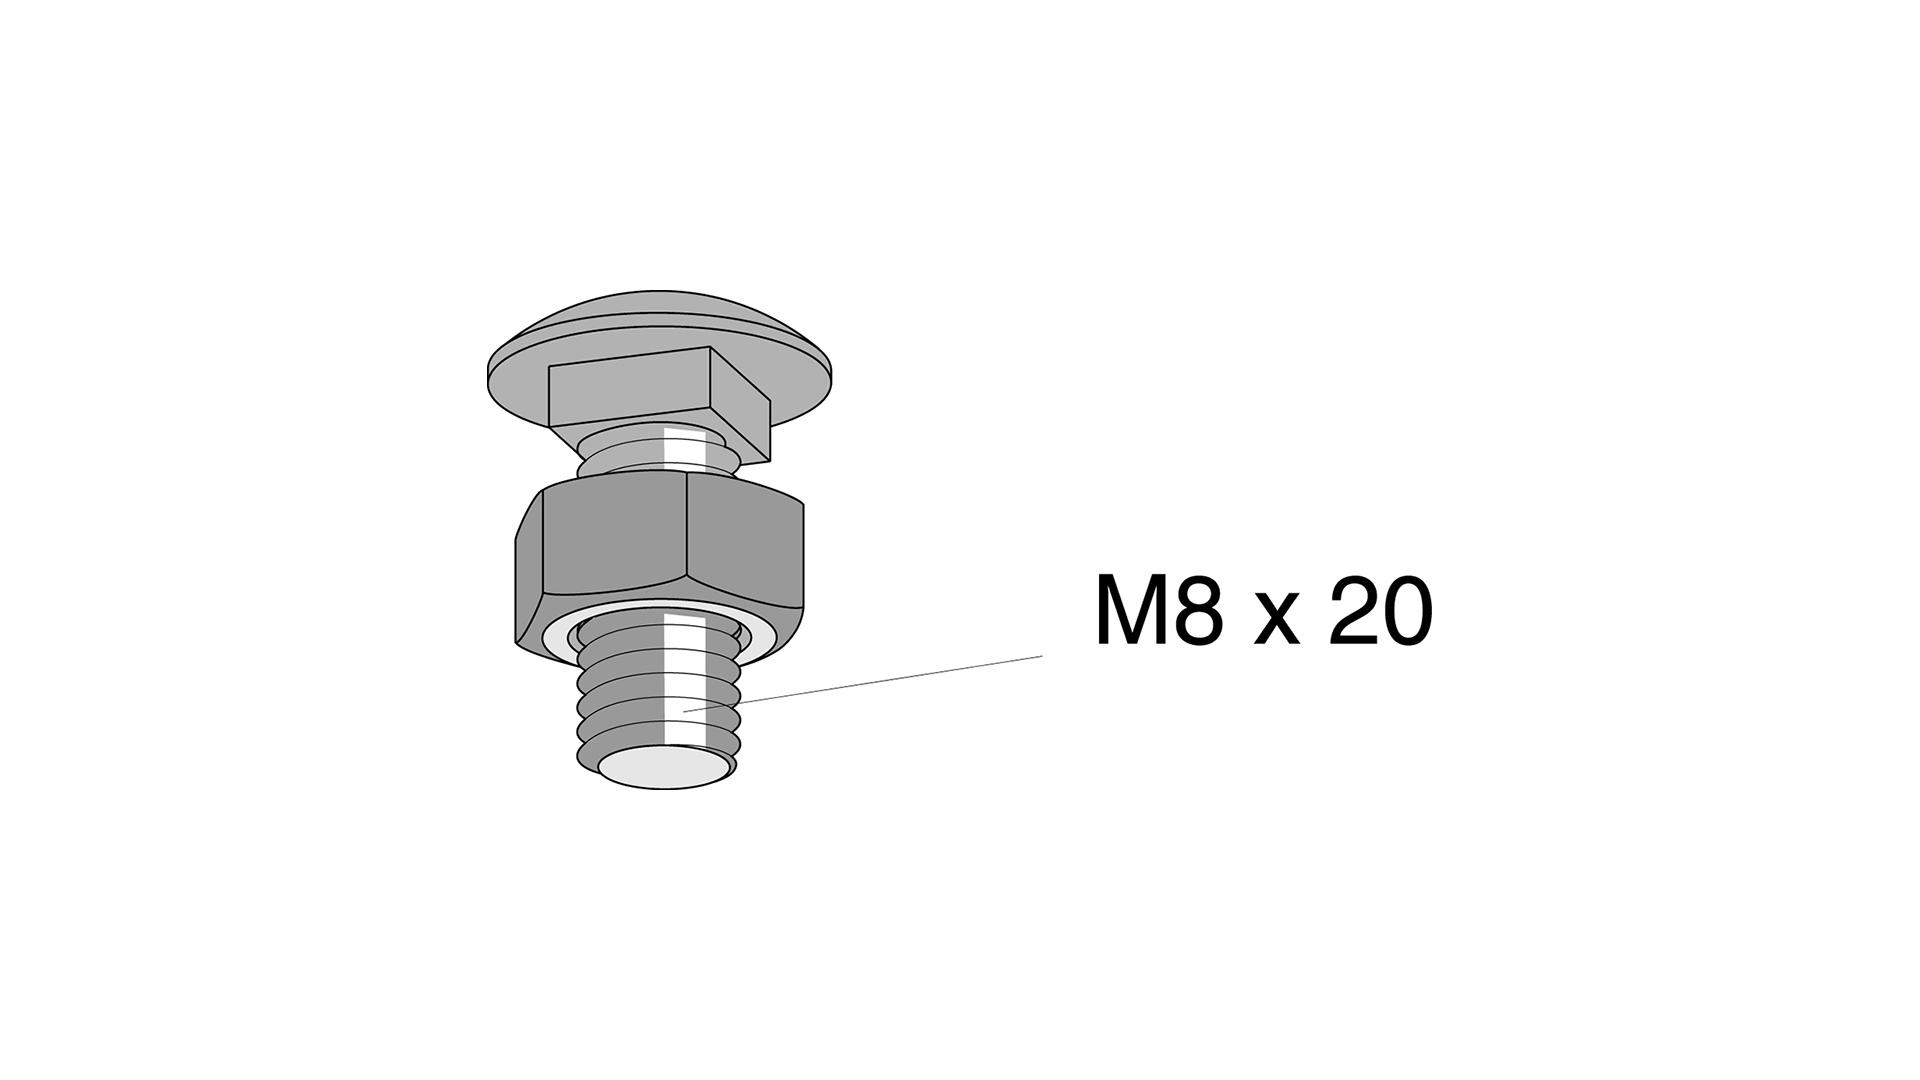 Bra Vagnsbult M8x20 mm 10 st OY-51